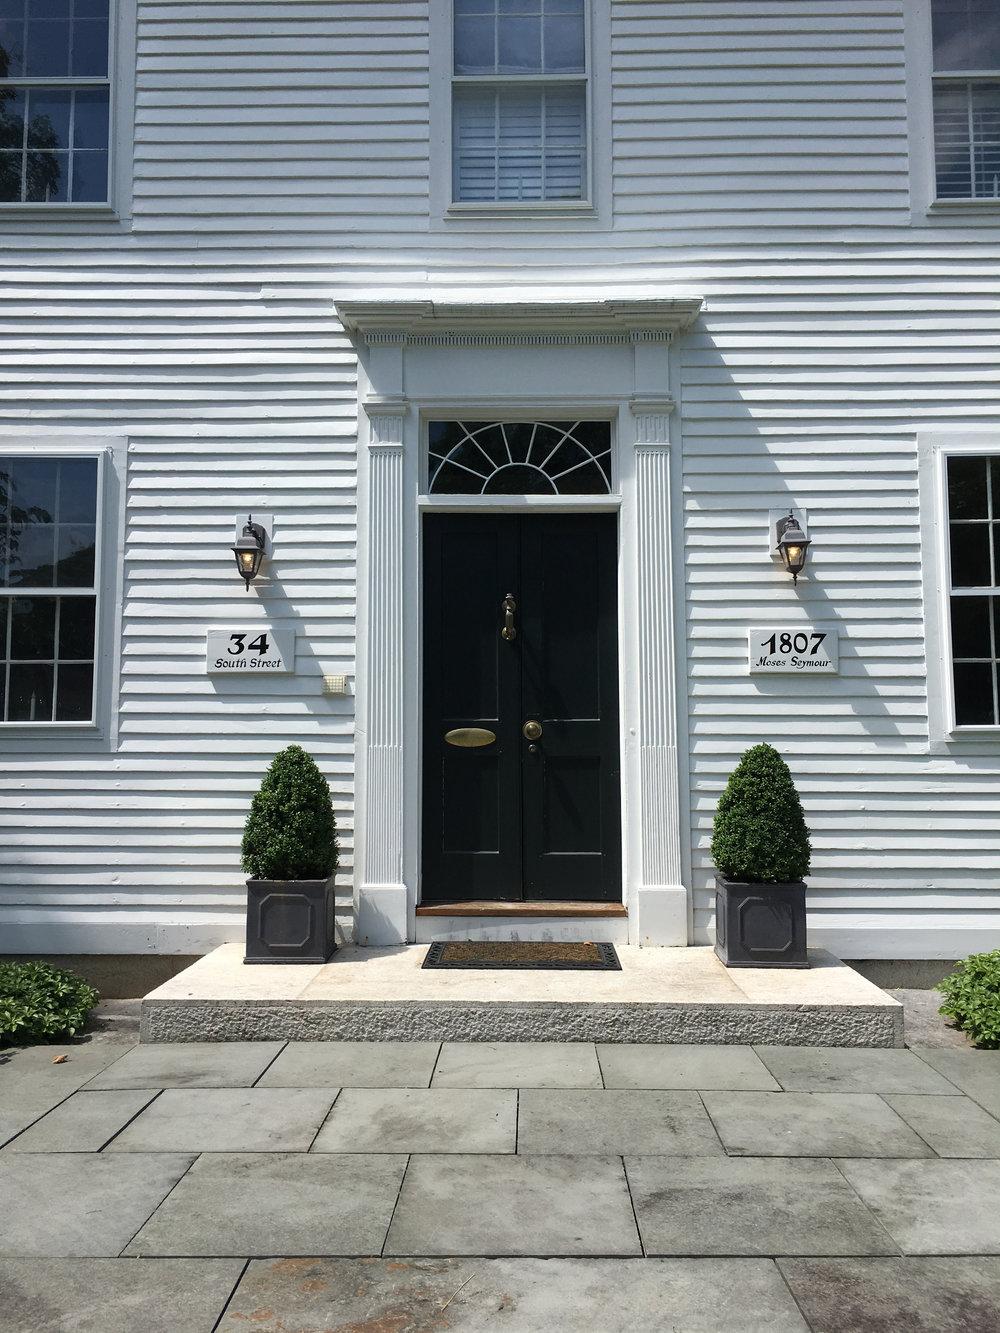 1807.Ozias Seymour House Door. Marla Patterson.jpg